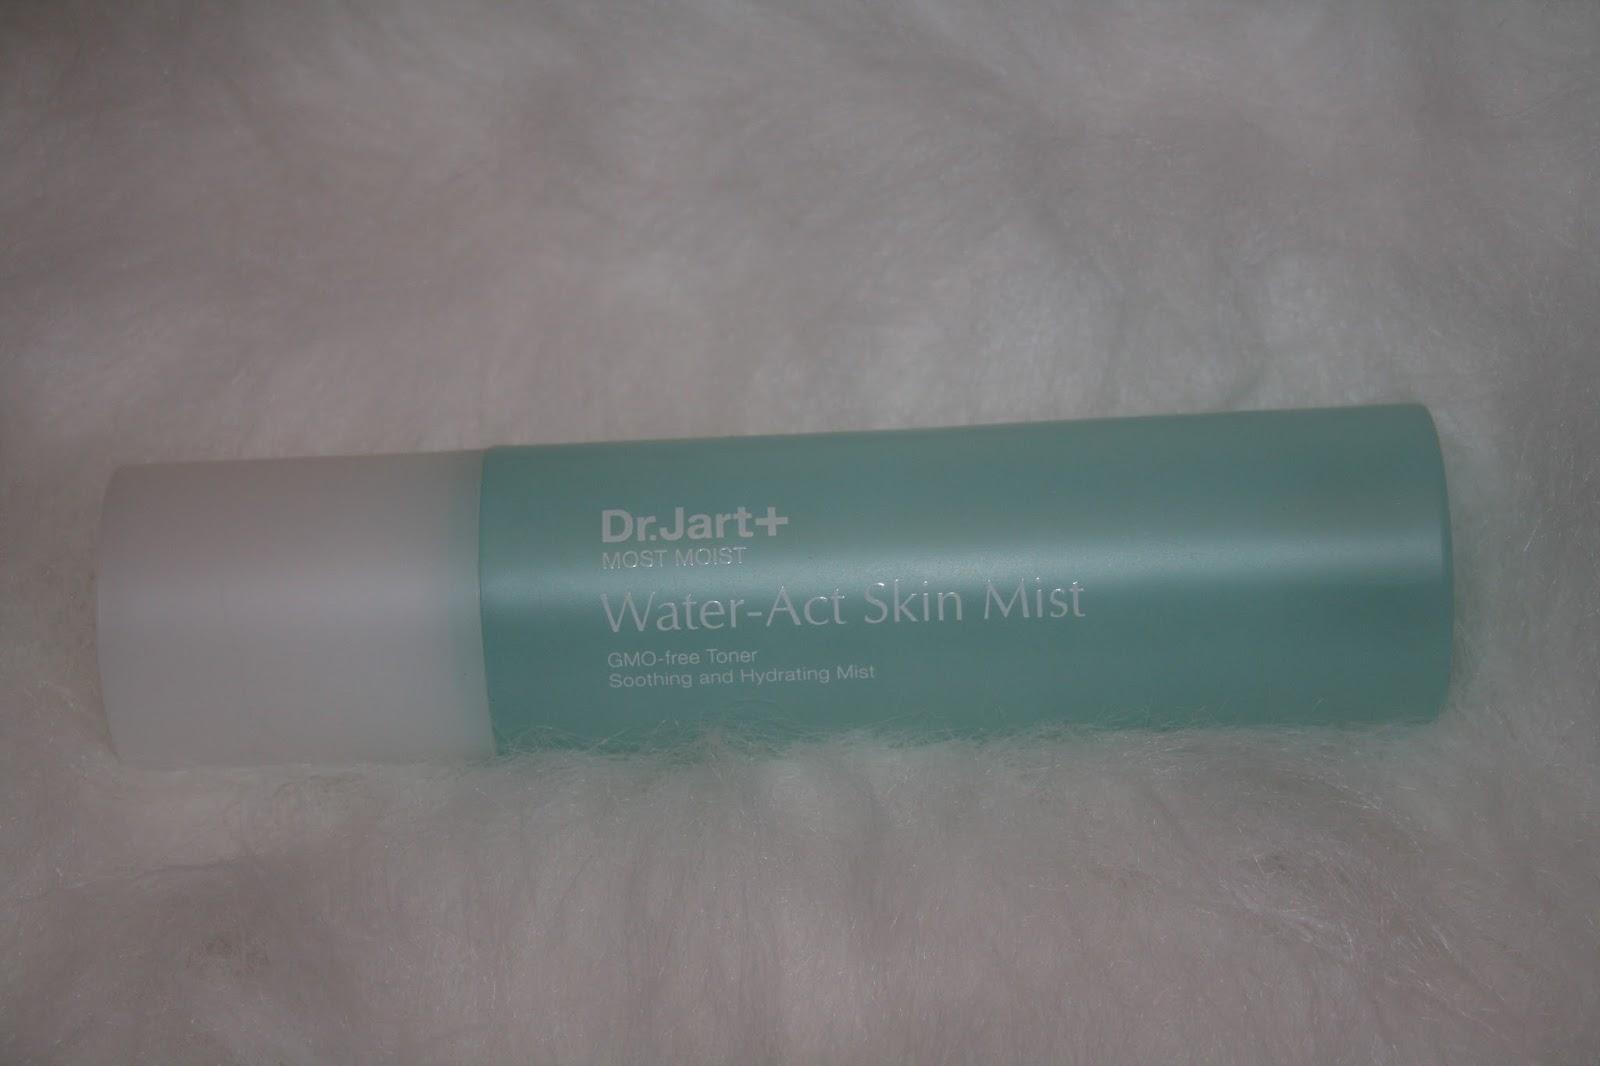 Dr Jart+ Water-Act Skin Mist